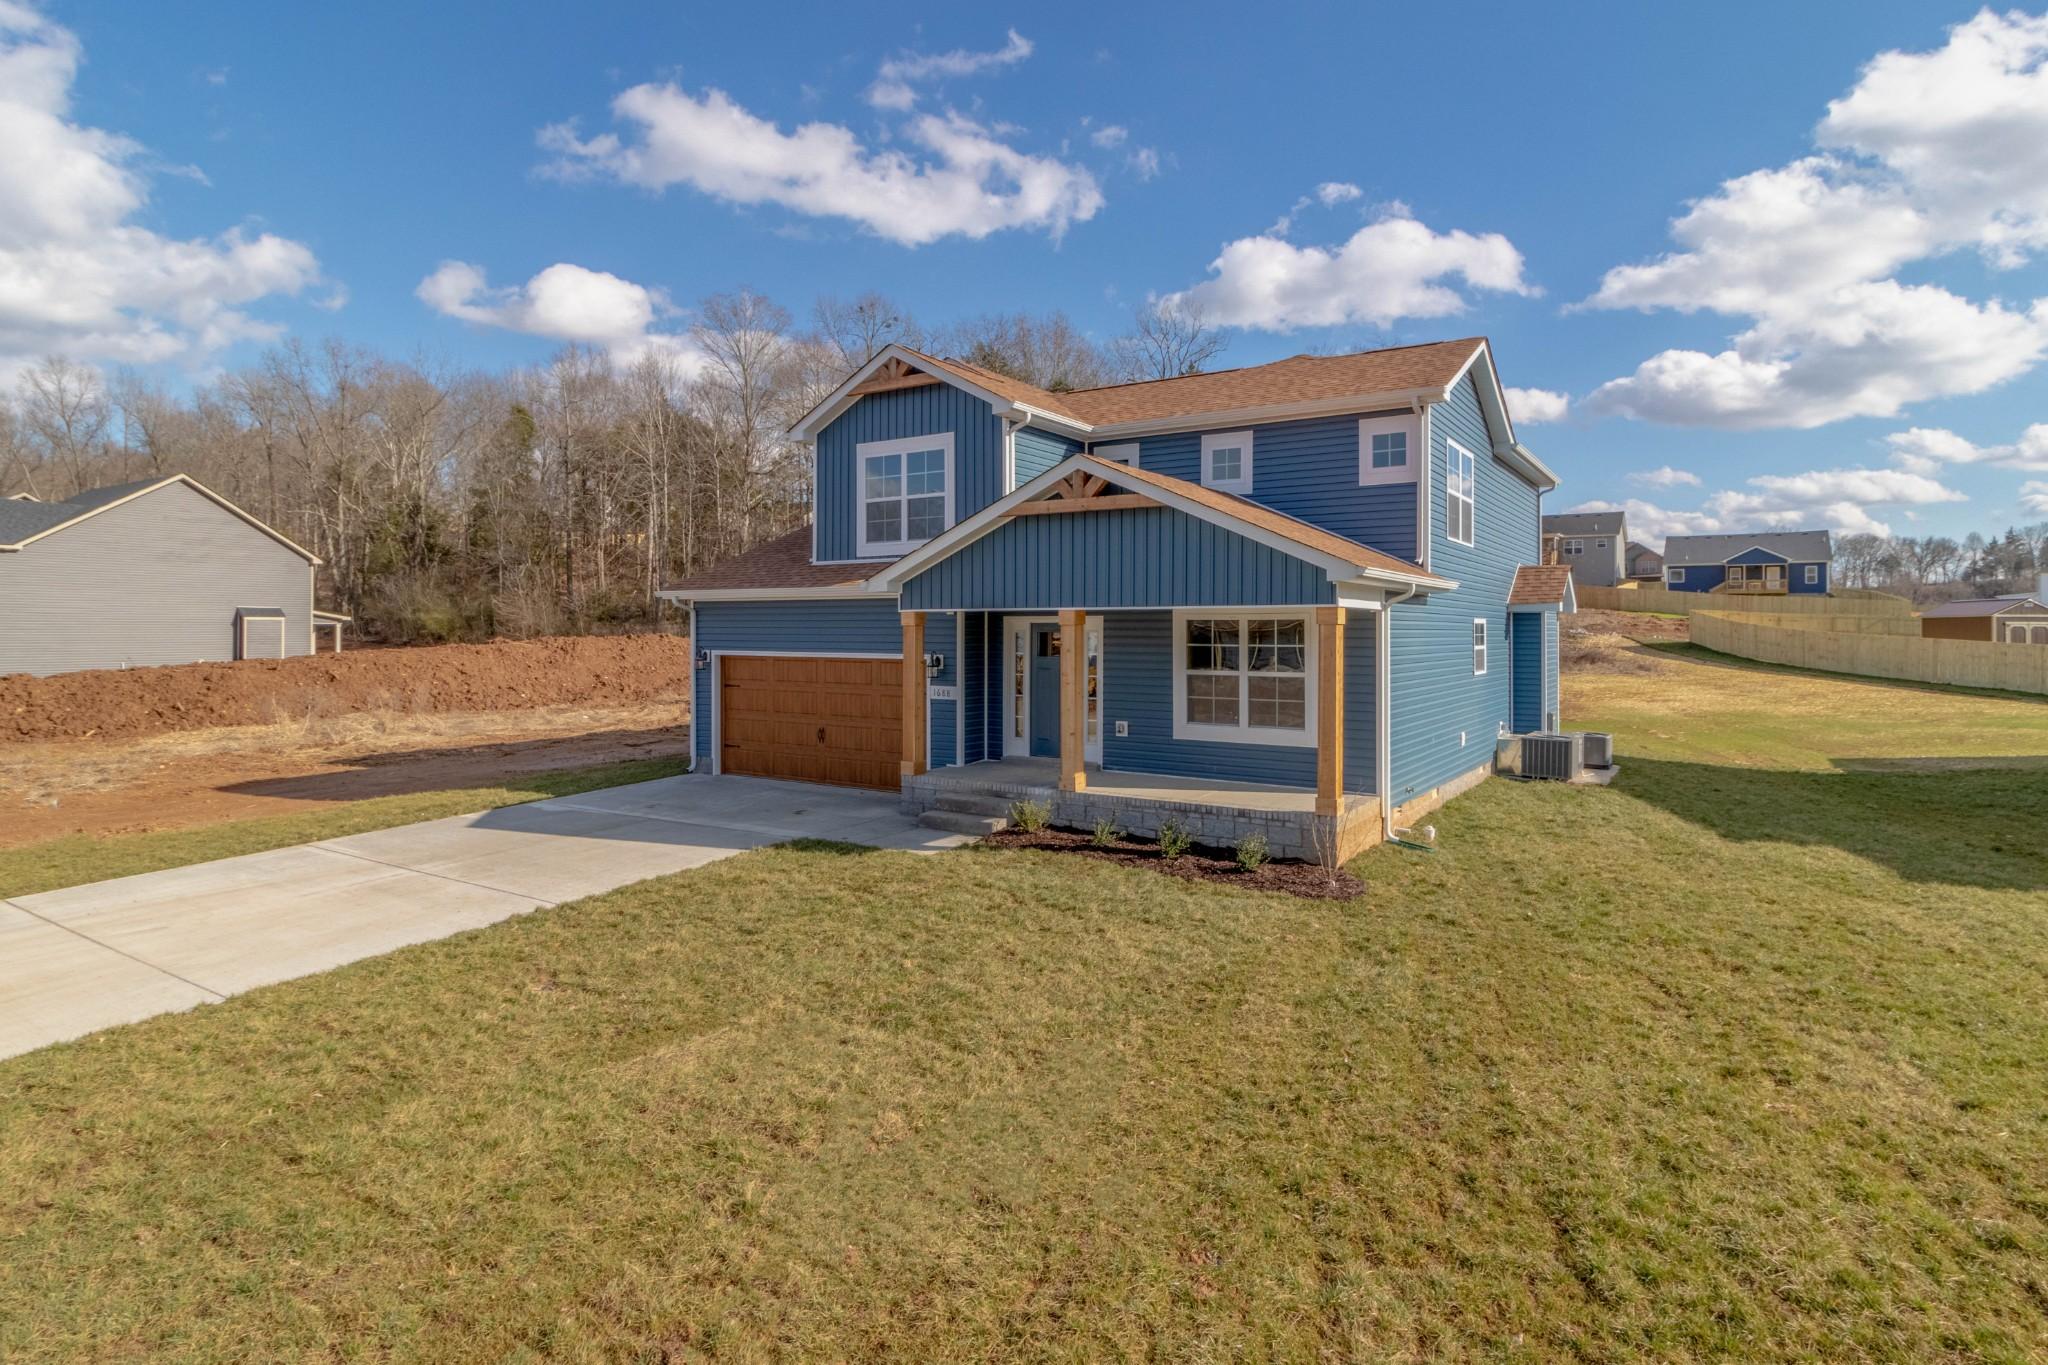 1688 Rains Rd, Clarksville, TN 37042 - Clarksville, TN real estate listing